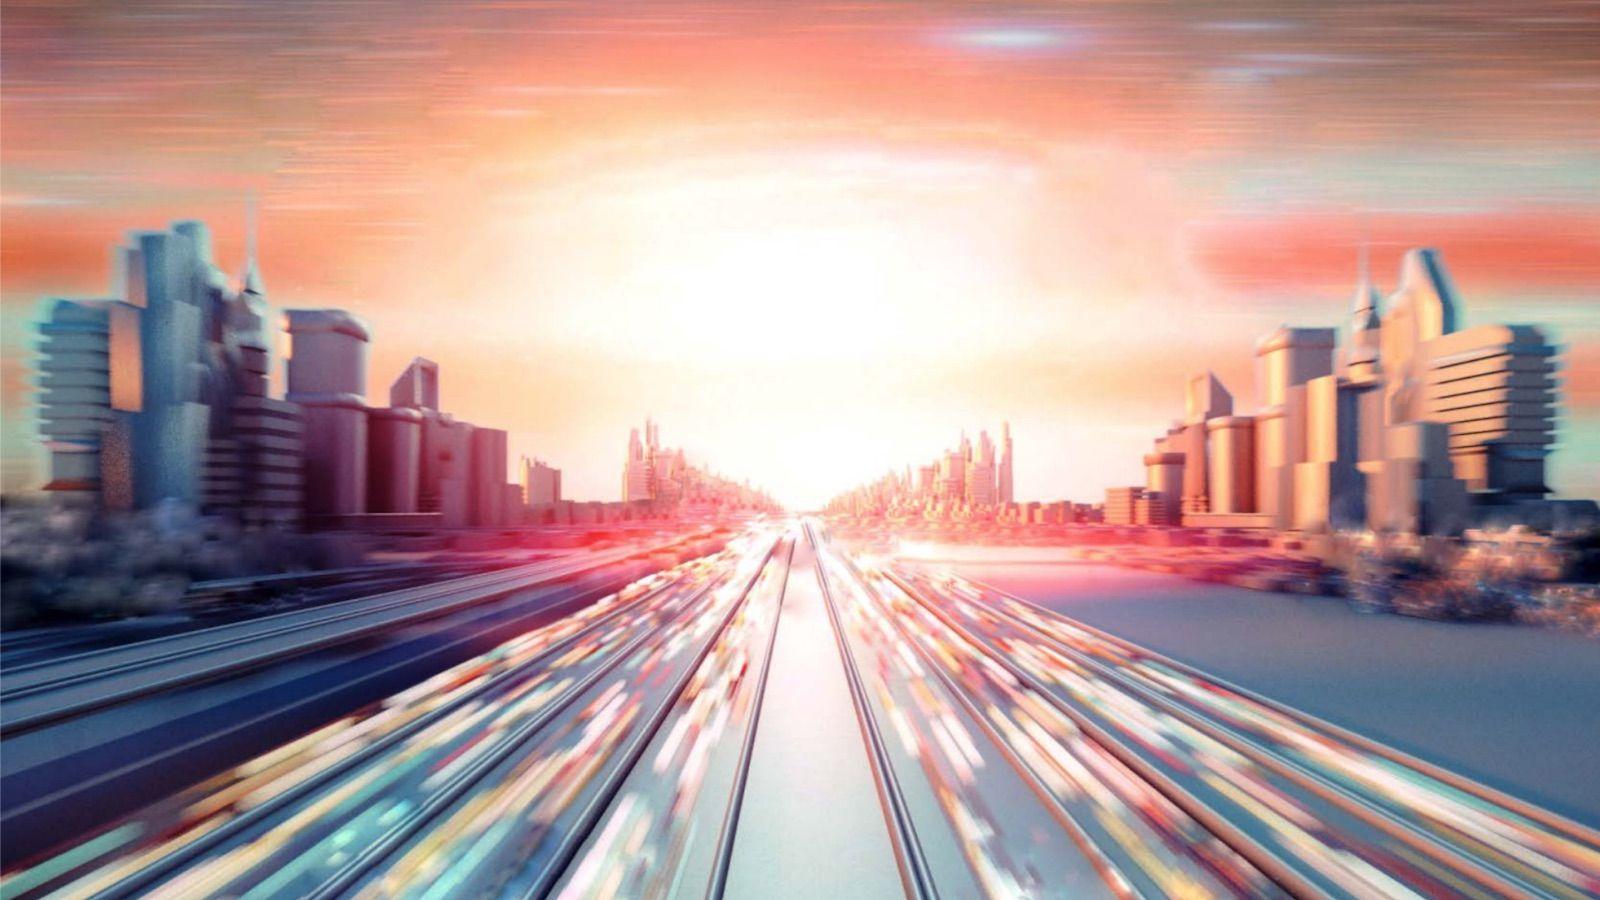 Illustration of futuristic city at sunset